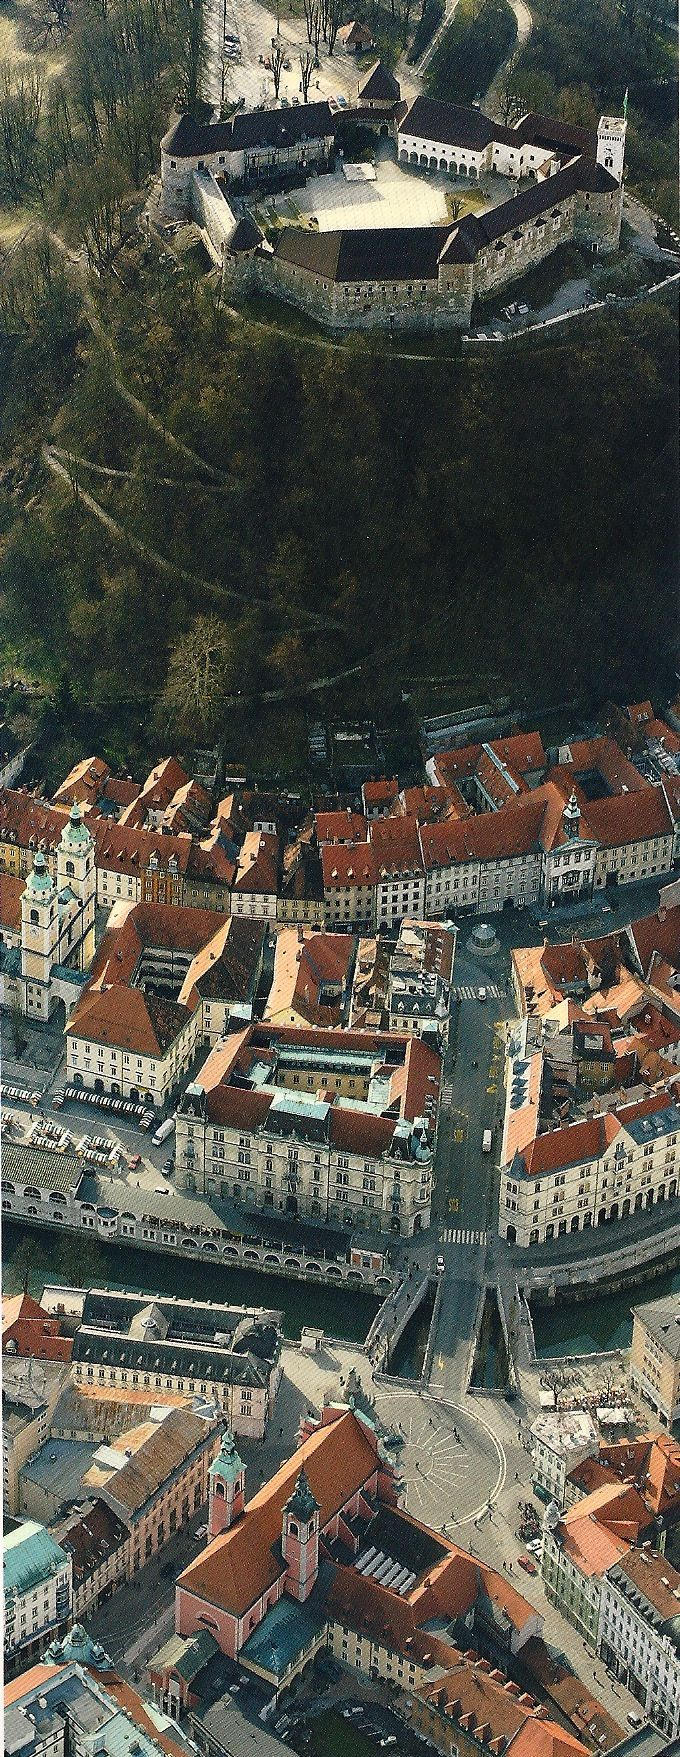 Ljubljana, Slovenia. One of Europe's smallest capitals.